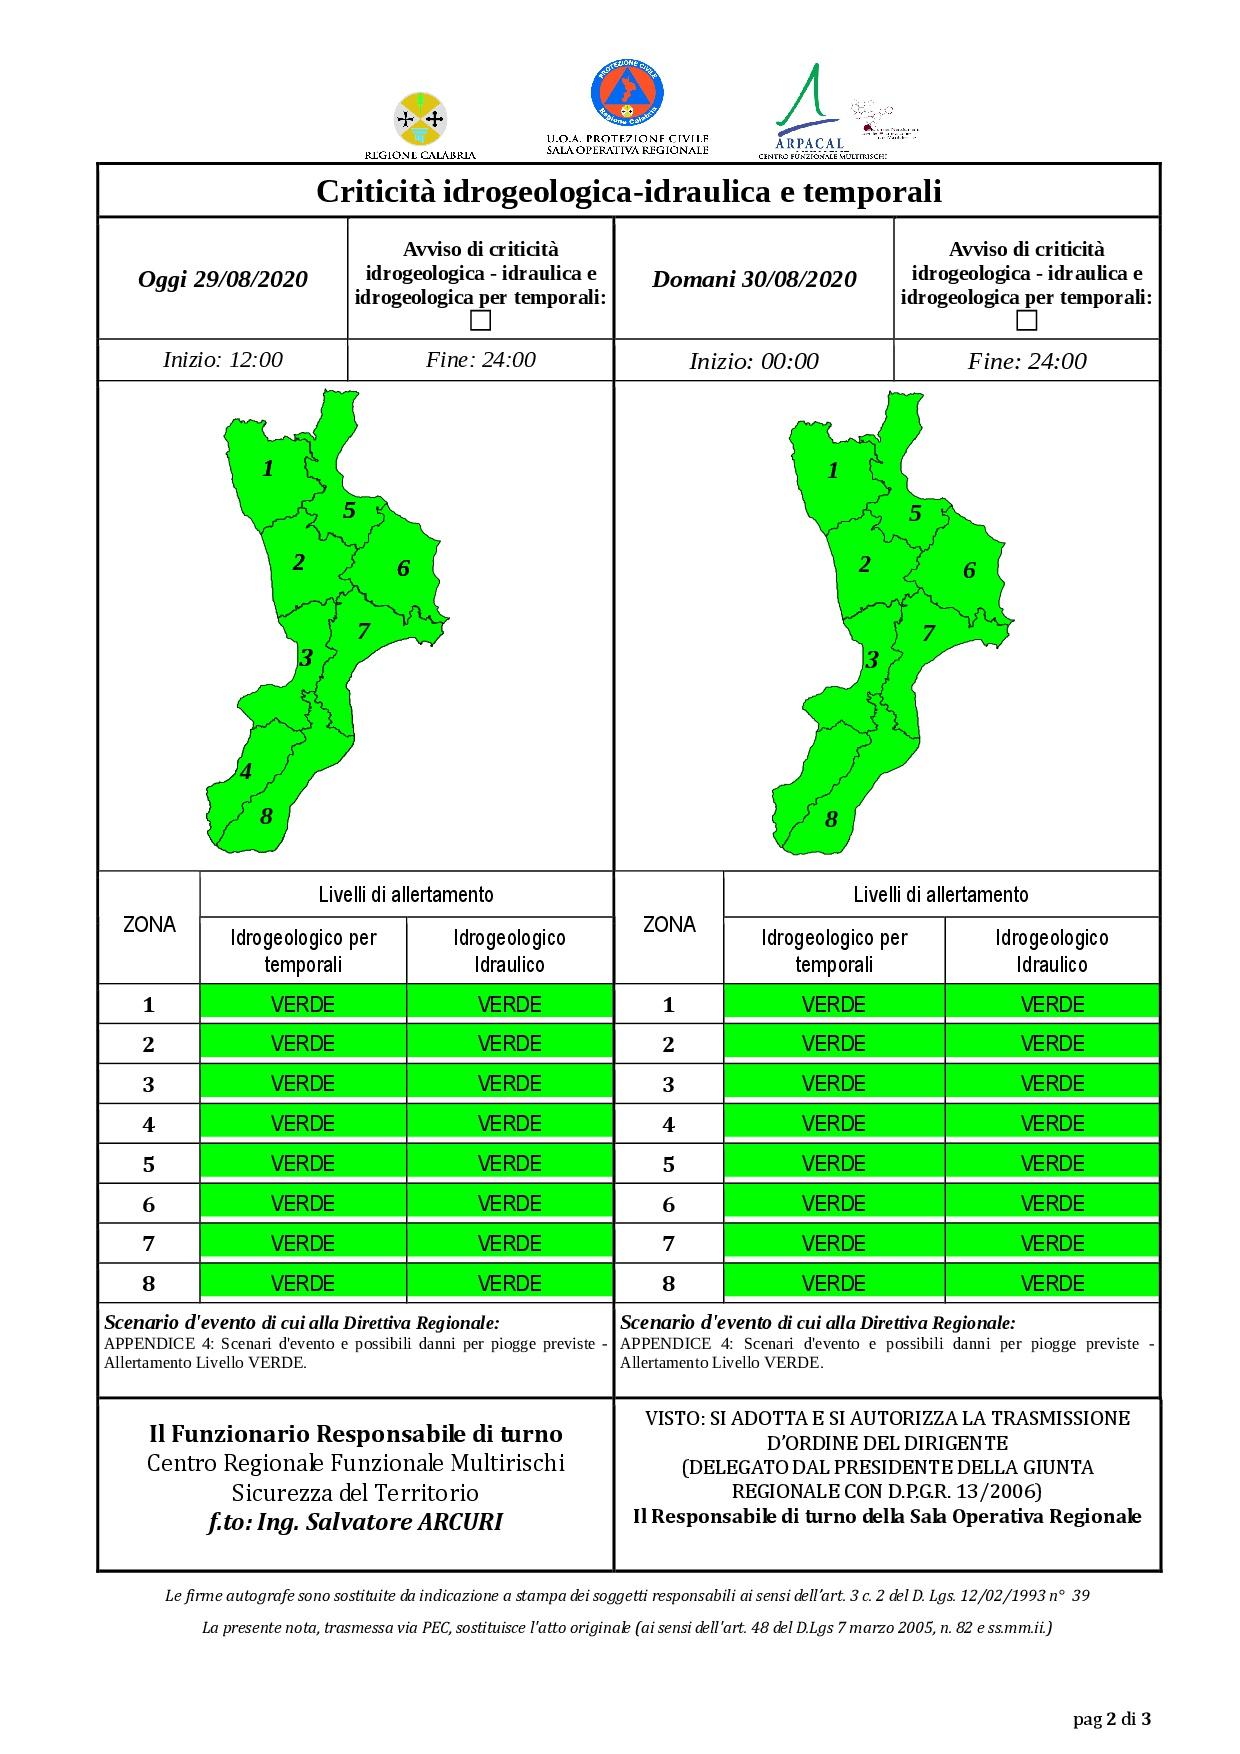 Criticità idrogeologica-idraulica e temporali in Calabria 29-08-2020